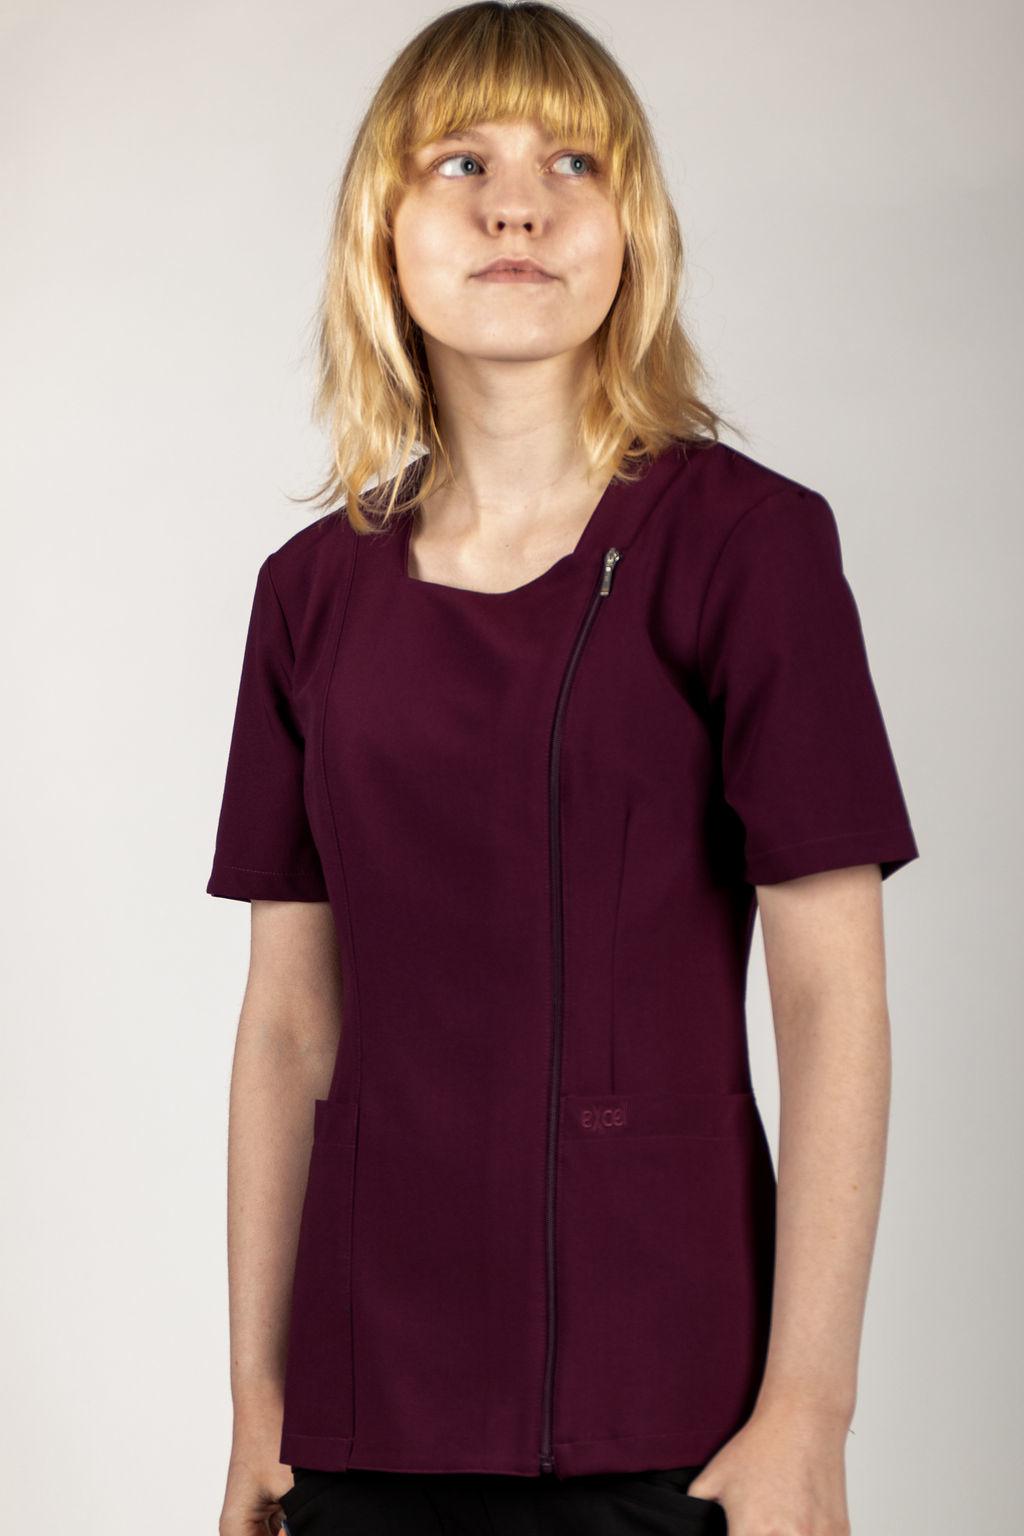 Burgundy Full Length Zipper Women's Top 590